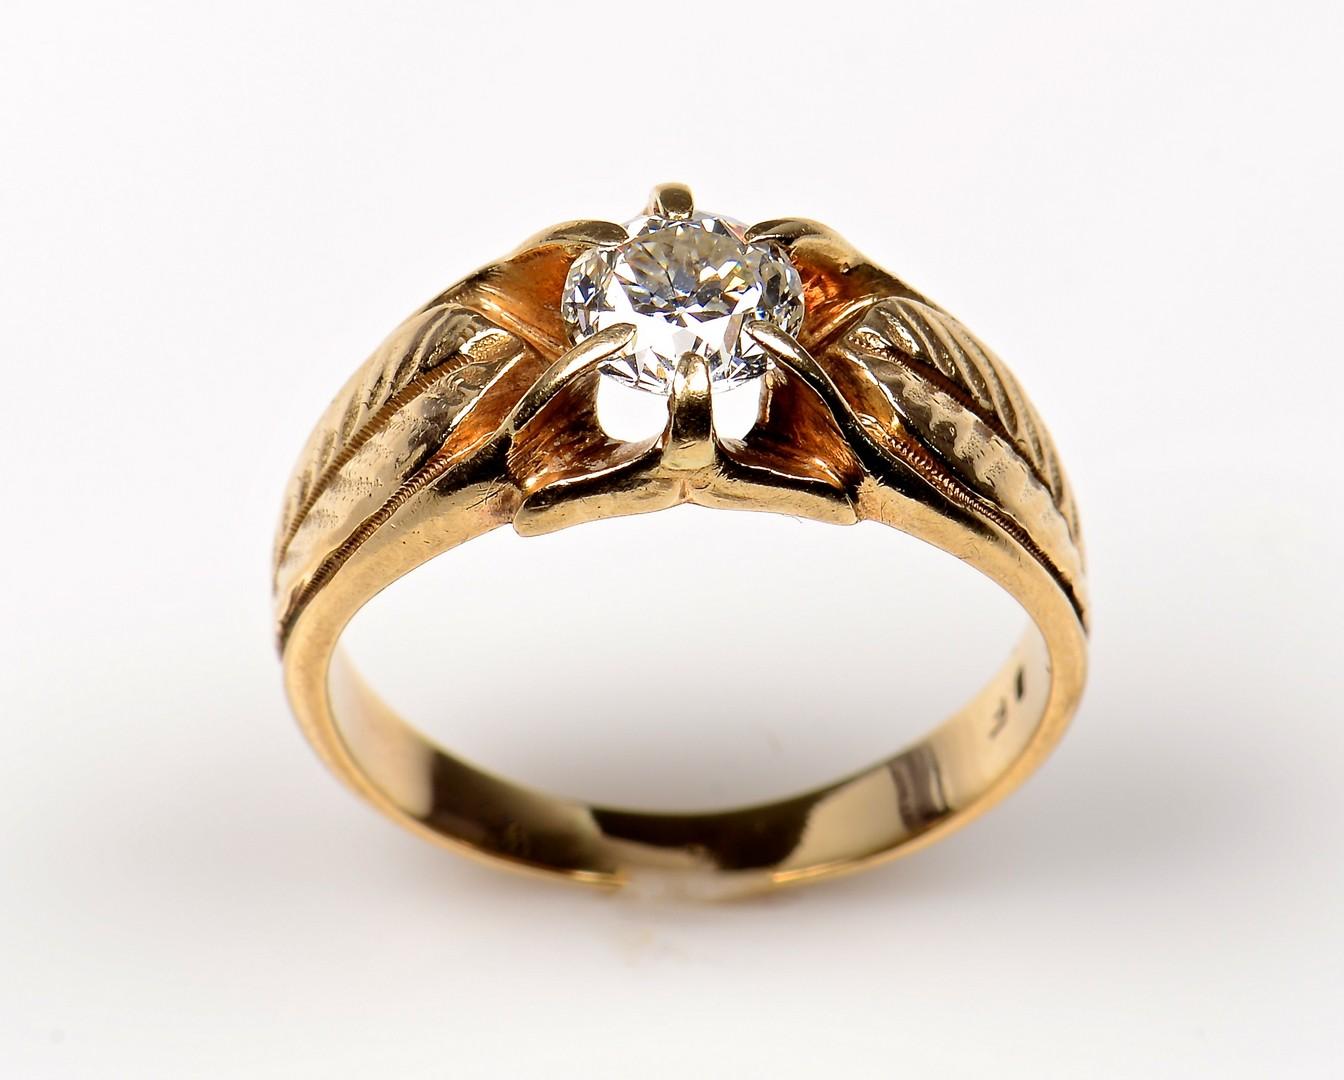 Lot 363: 10K Vintage Gents 1 ct OMC Ring